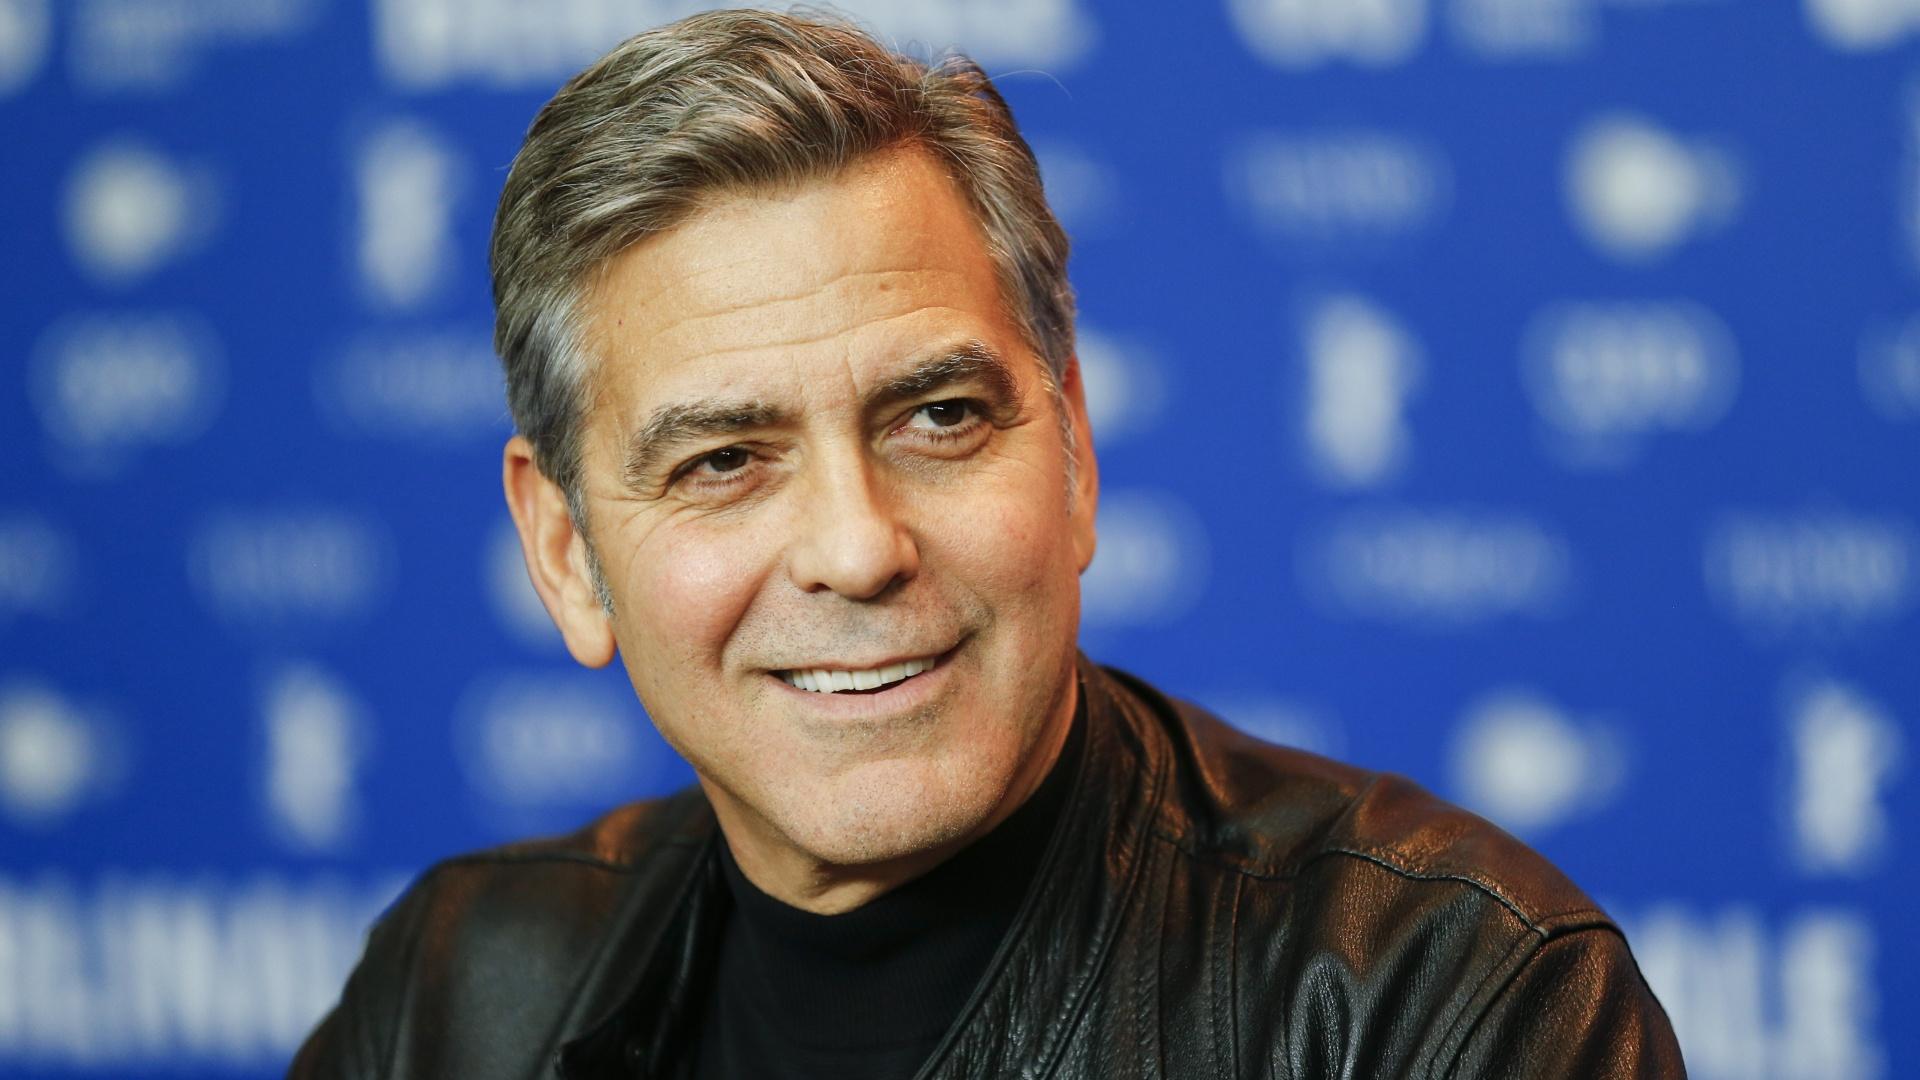 Рост, вес, возраст. Сколько лет Джорджу Клуни фото